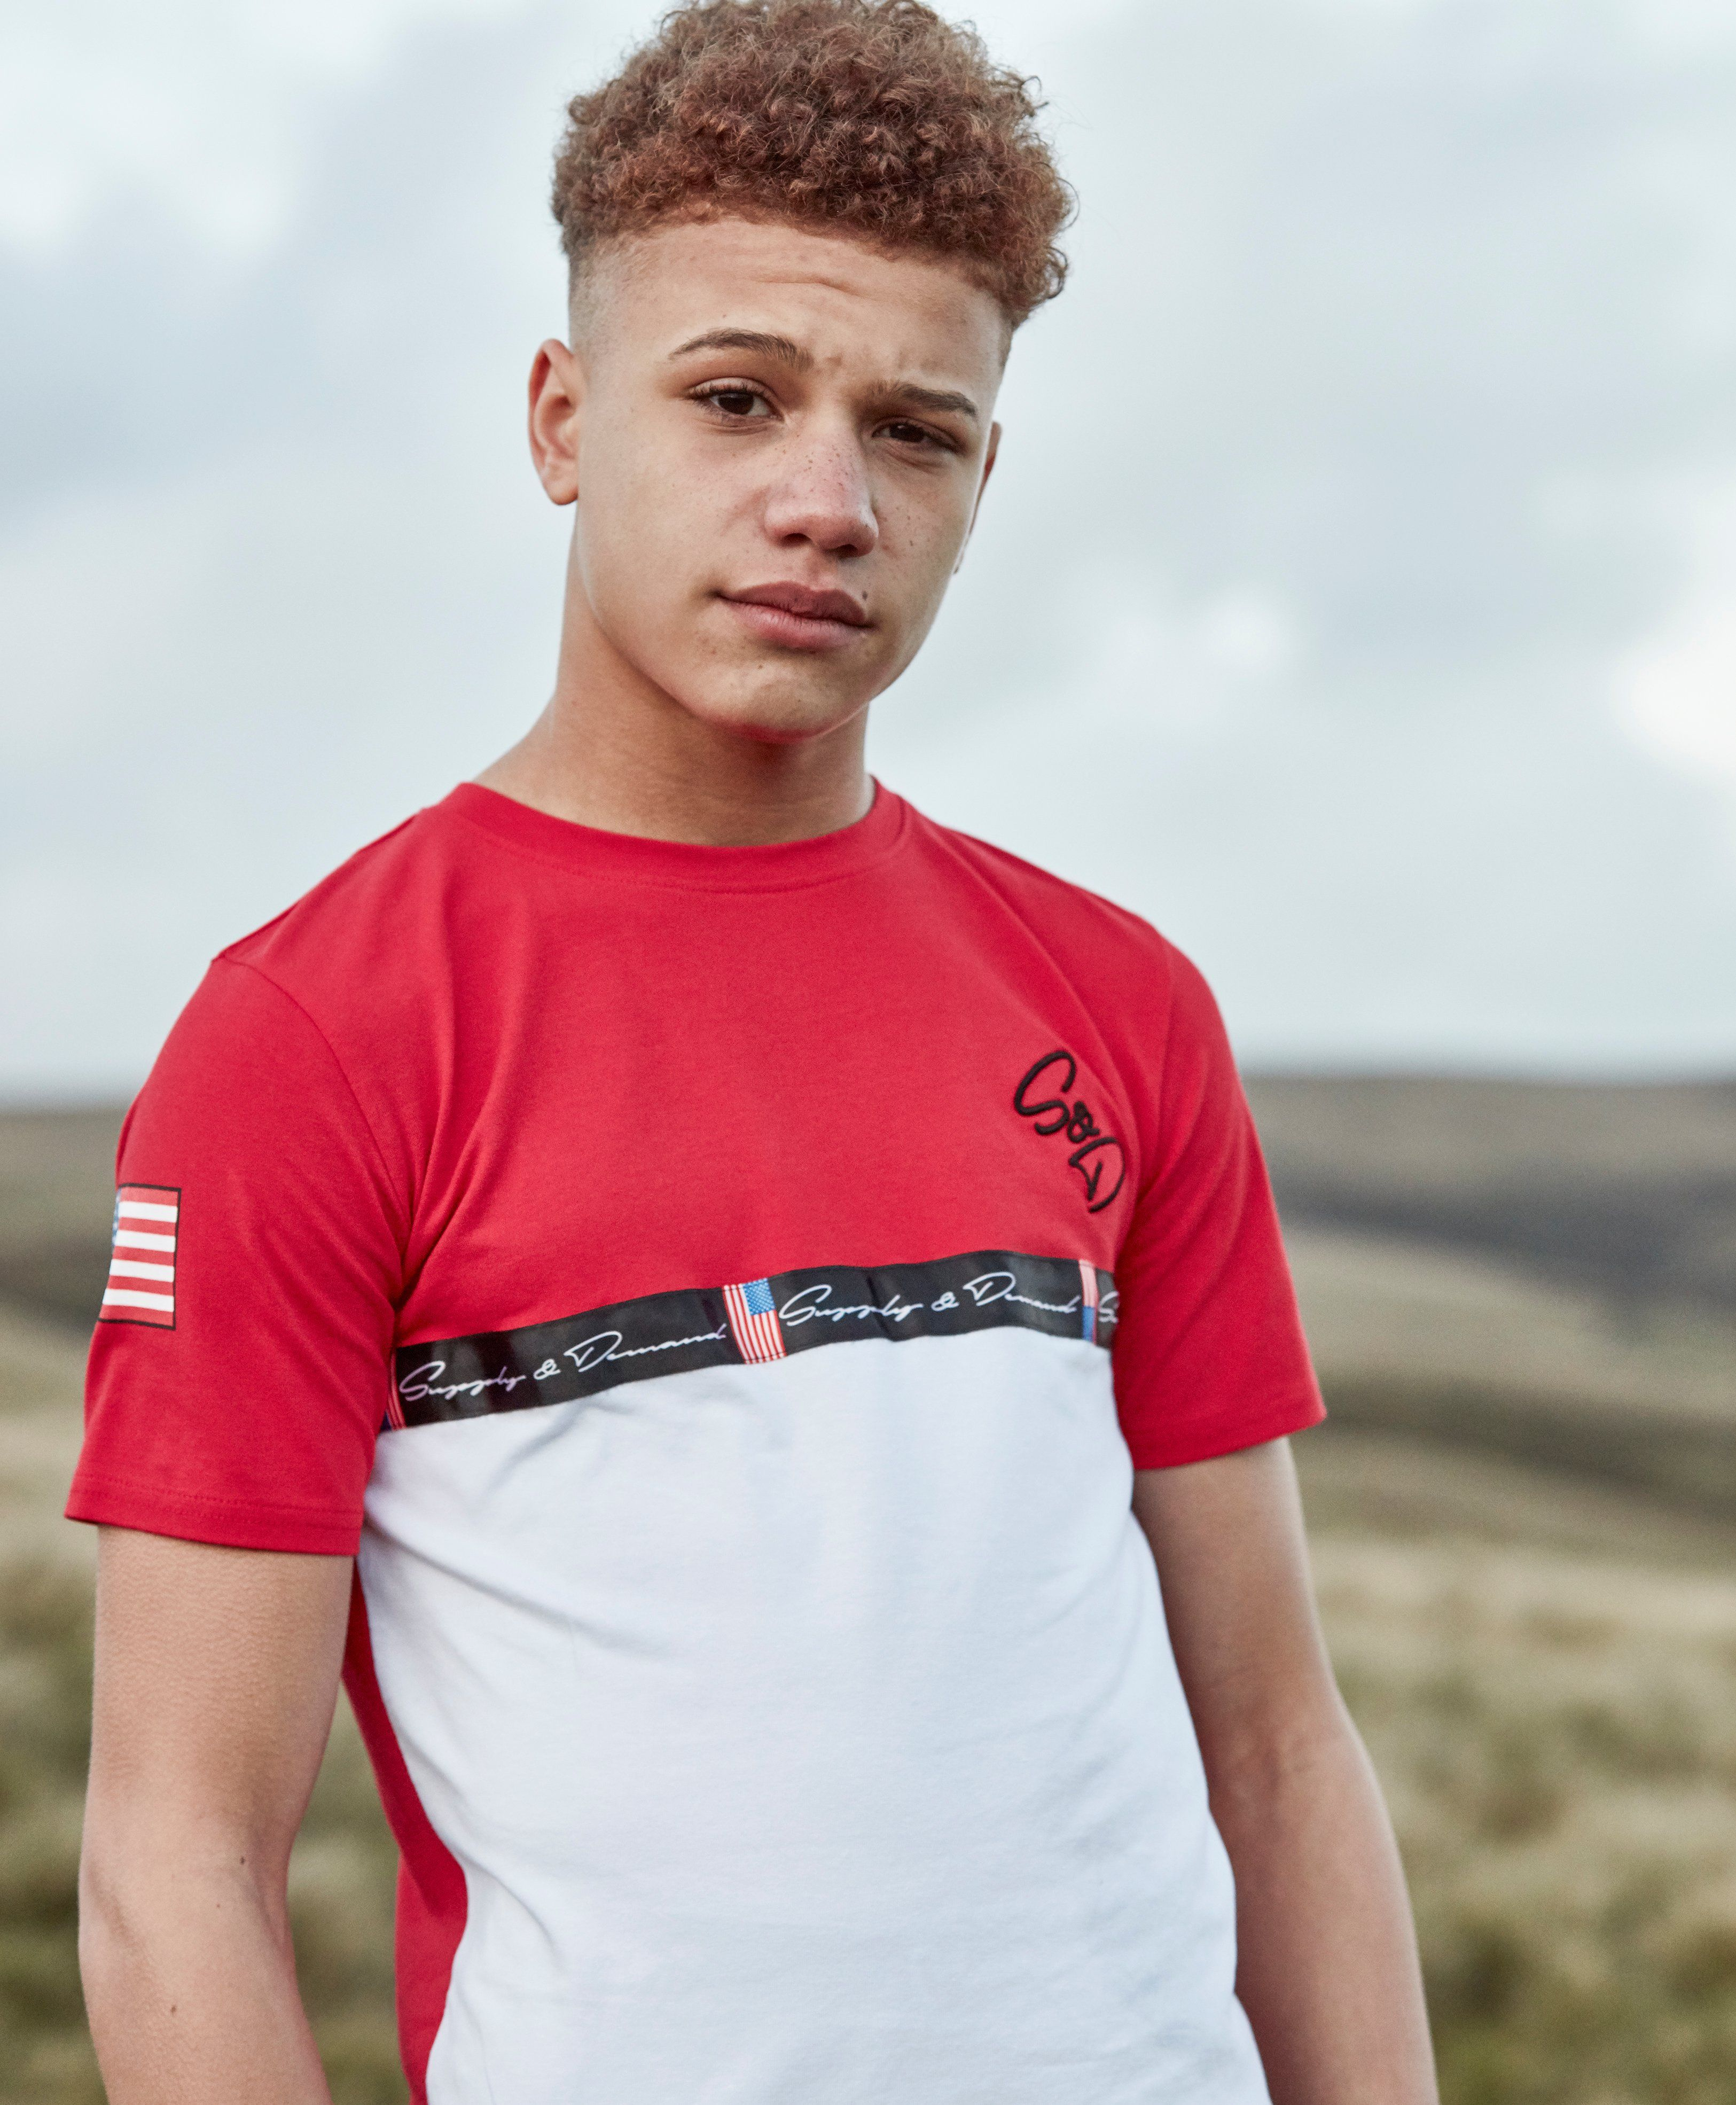 Supply & Demand Cut and Sew T-Shirt Junior